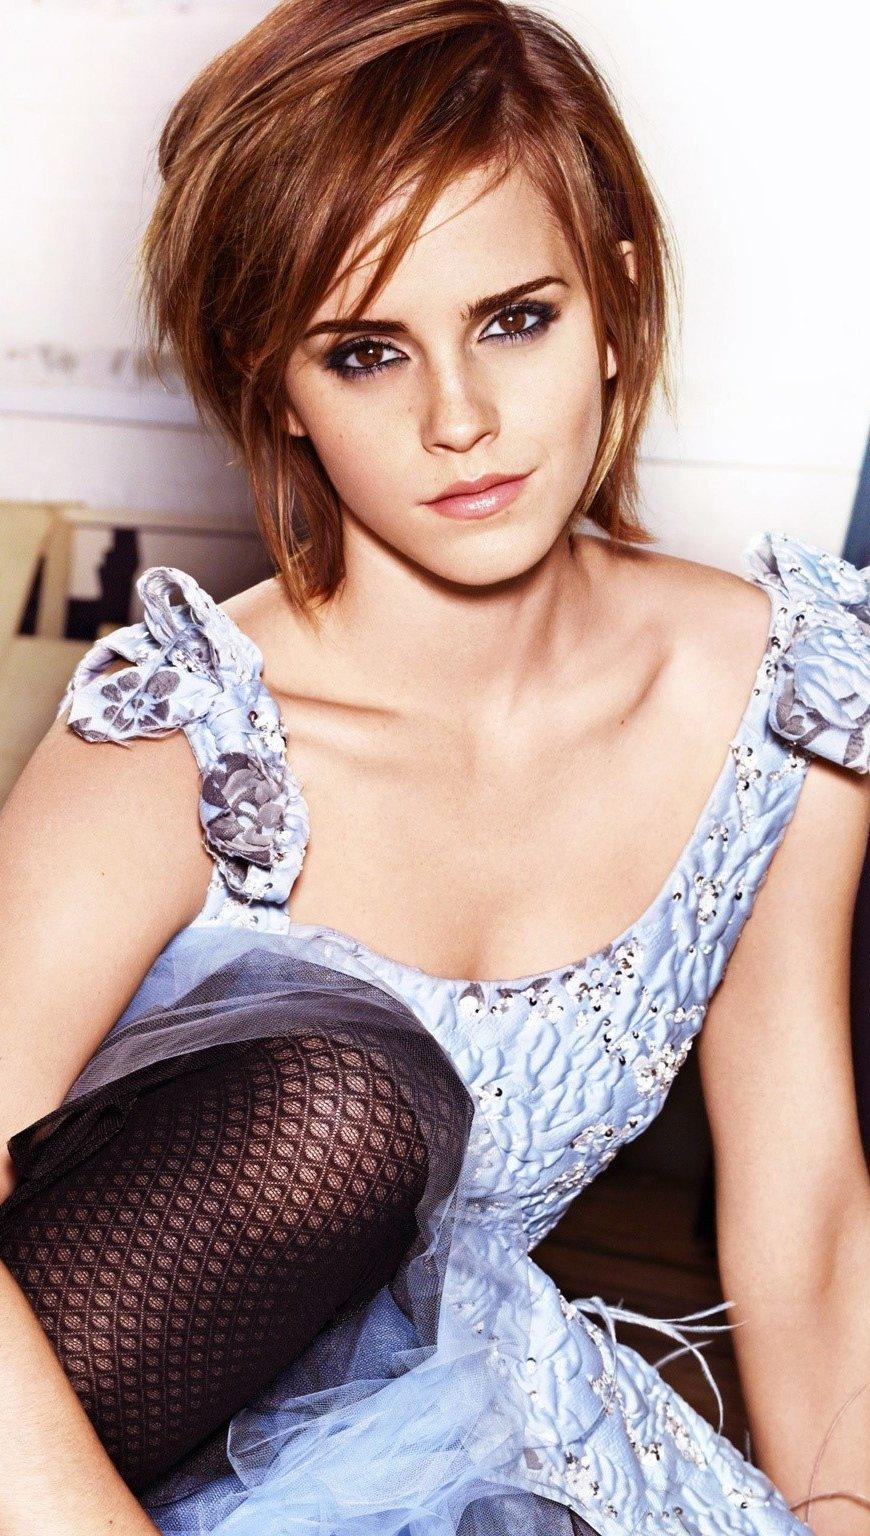 Fondos de pantalla Emma Watson 2 Vertical